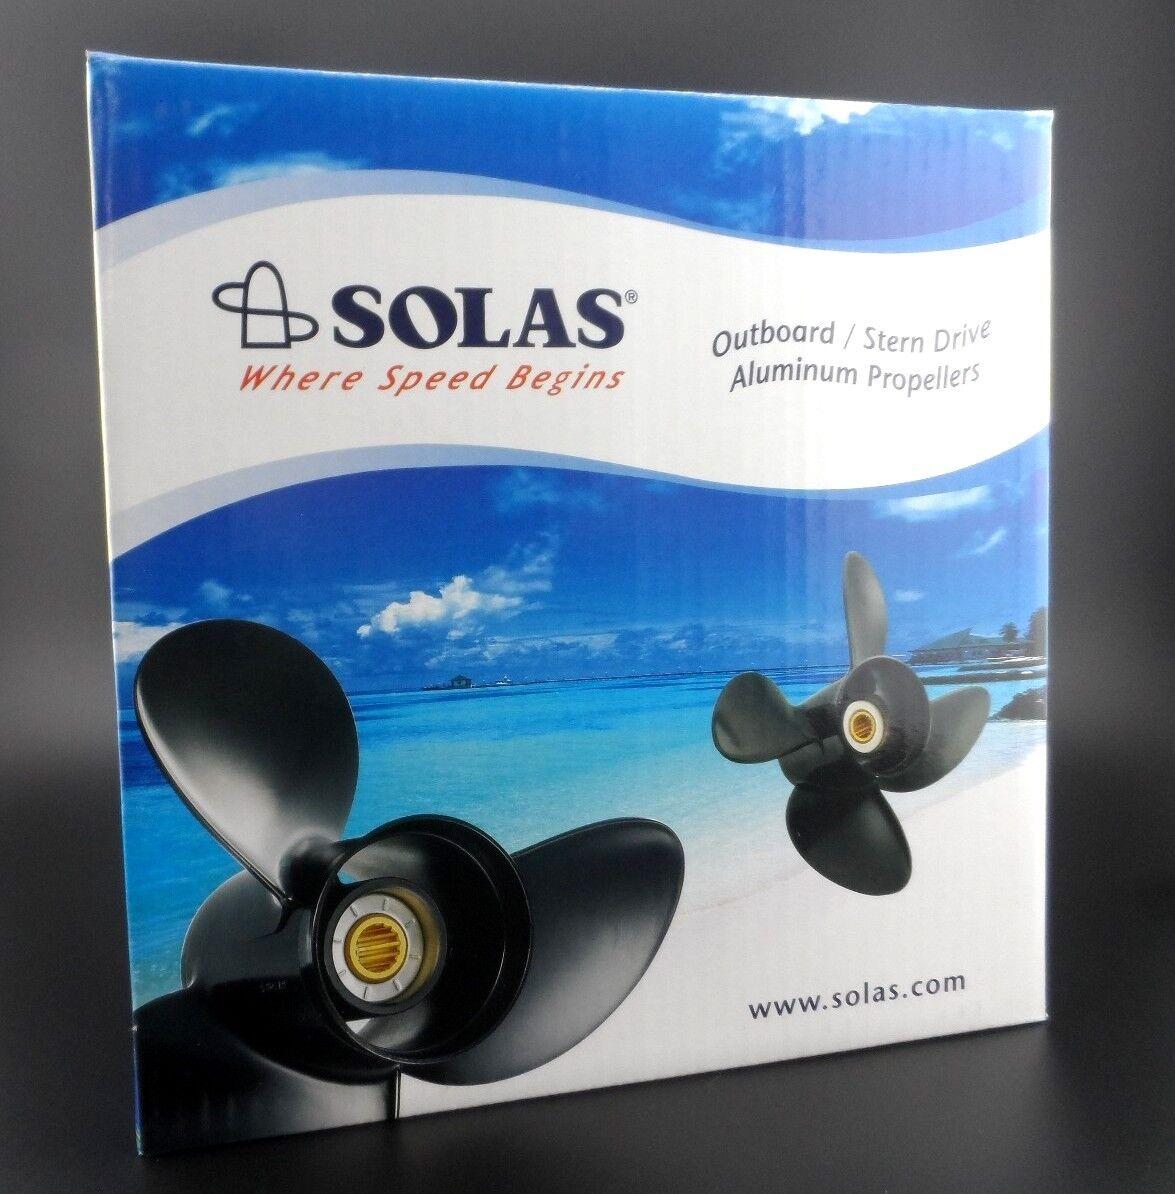 Solas Amita 3 Propeller hélice for SUZUKI Outboard 4111-093-11A 3X9 1/4X11